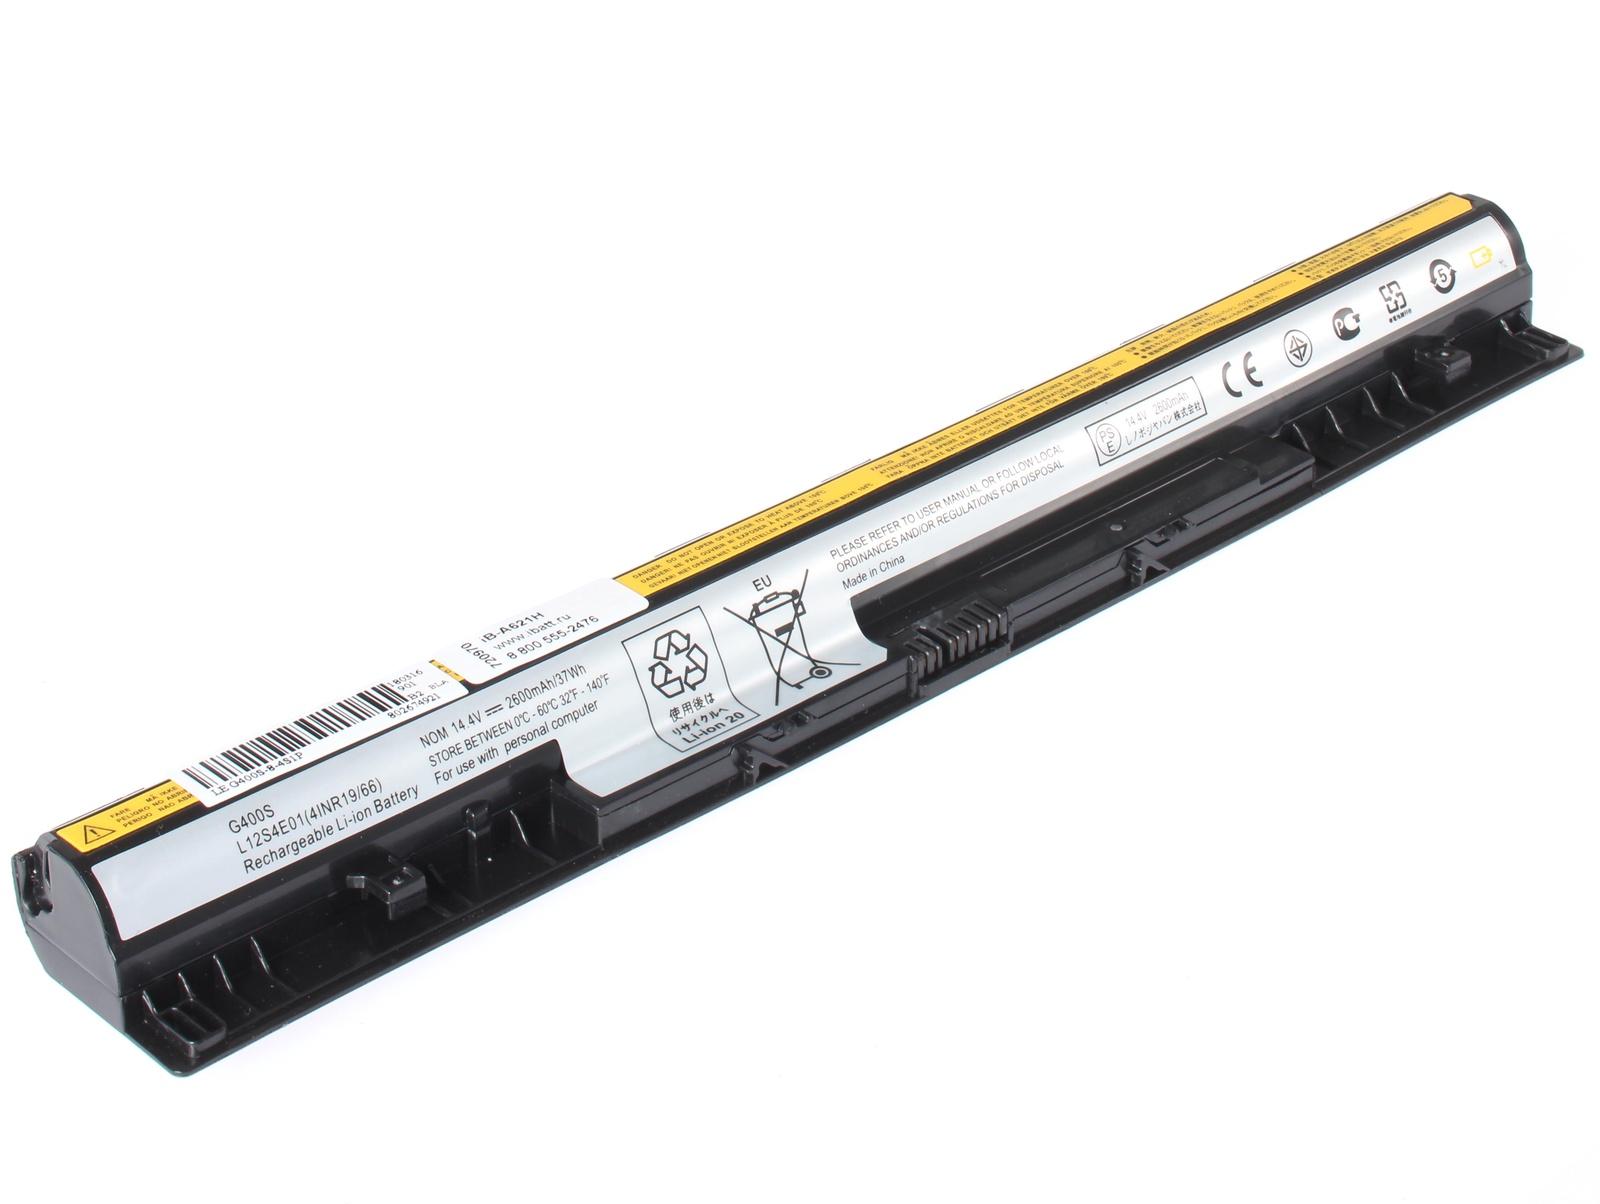 Аккумуляторная батарея iBatt iB-T2-A621H 2600mAh для ноутбуков iBM-Lenovo для IdeaPad Z710 59396873, IdeaPad Z710 59402428, IdeaPad G505s Series, IdeaPad S435, IdeaPad S510p 59391664, IdeaPad Z710 59396875, IdeaPad Z710 59418574, IdeaPad Z710 59423464, 6 cell 11 1v 5200mah новый замена аккумулятор для ноутбука lenovo ideapad y460 ideapad y560